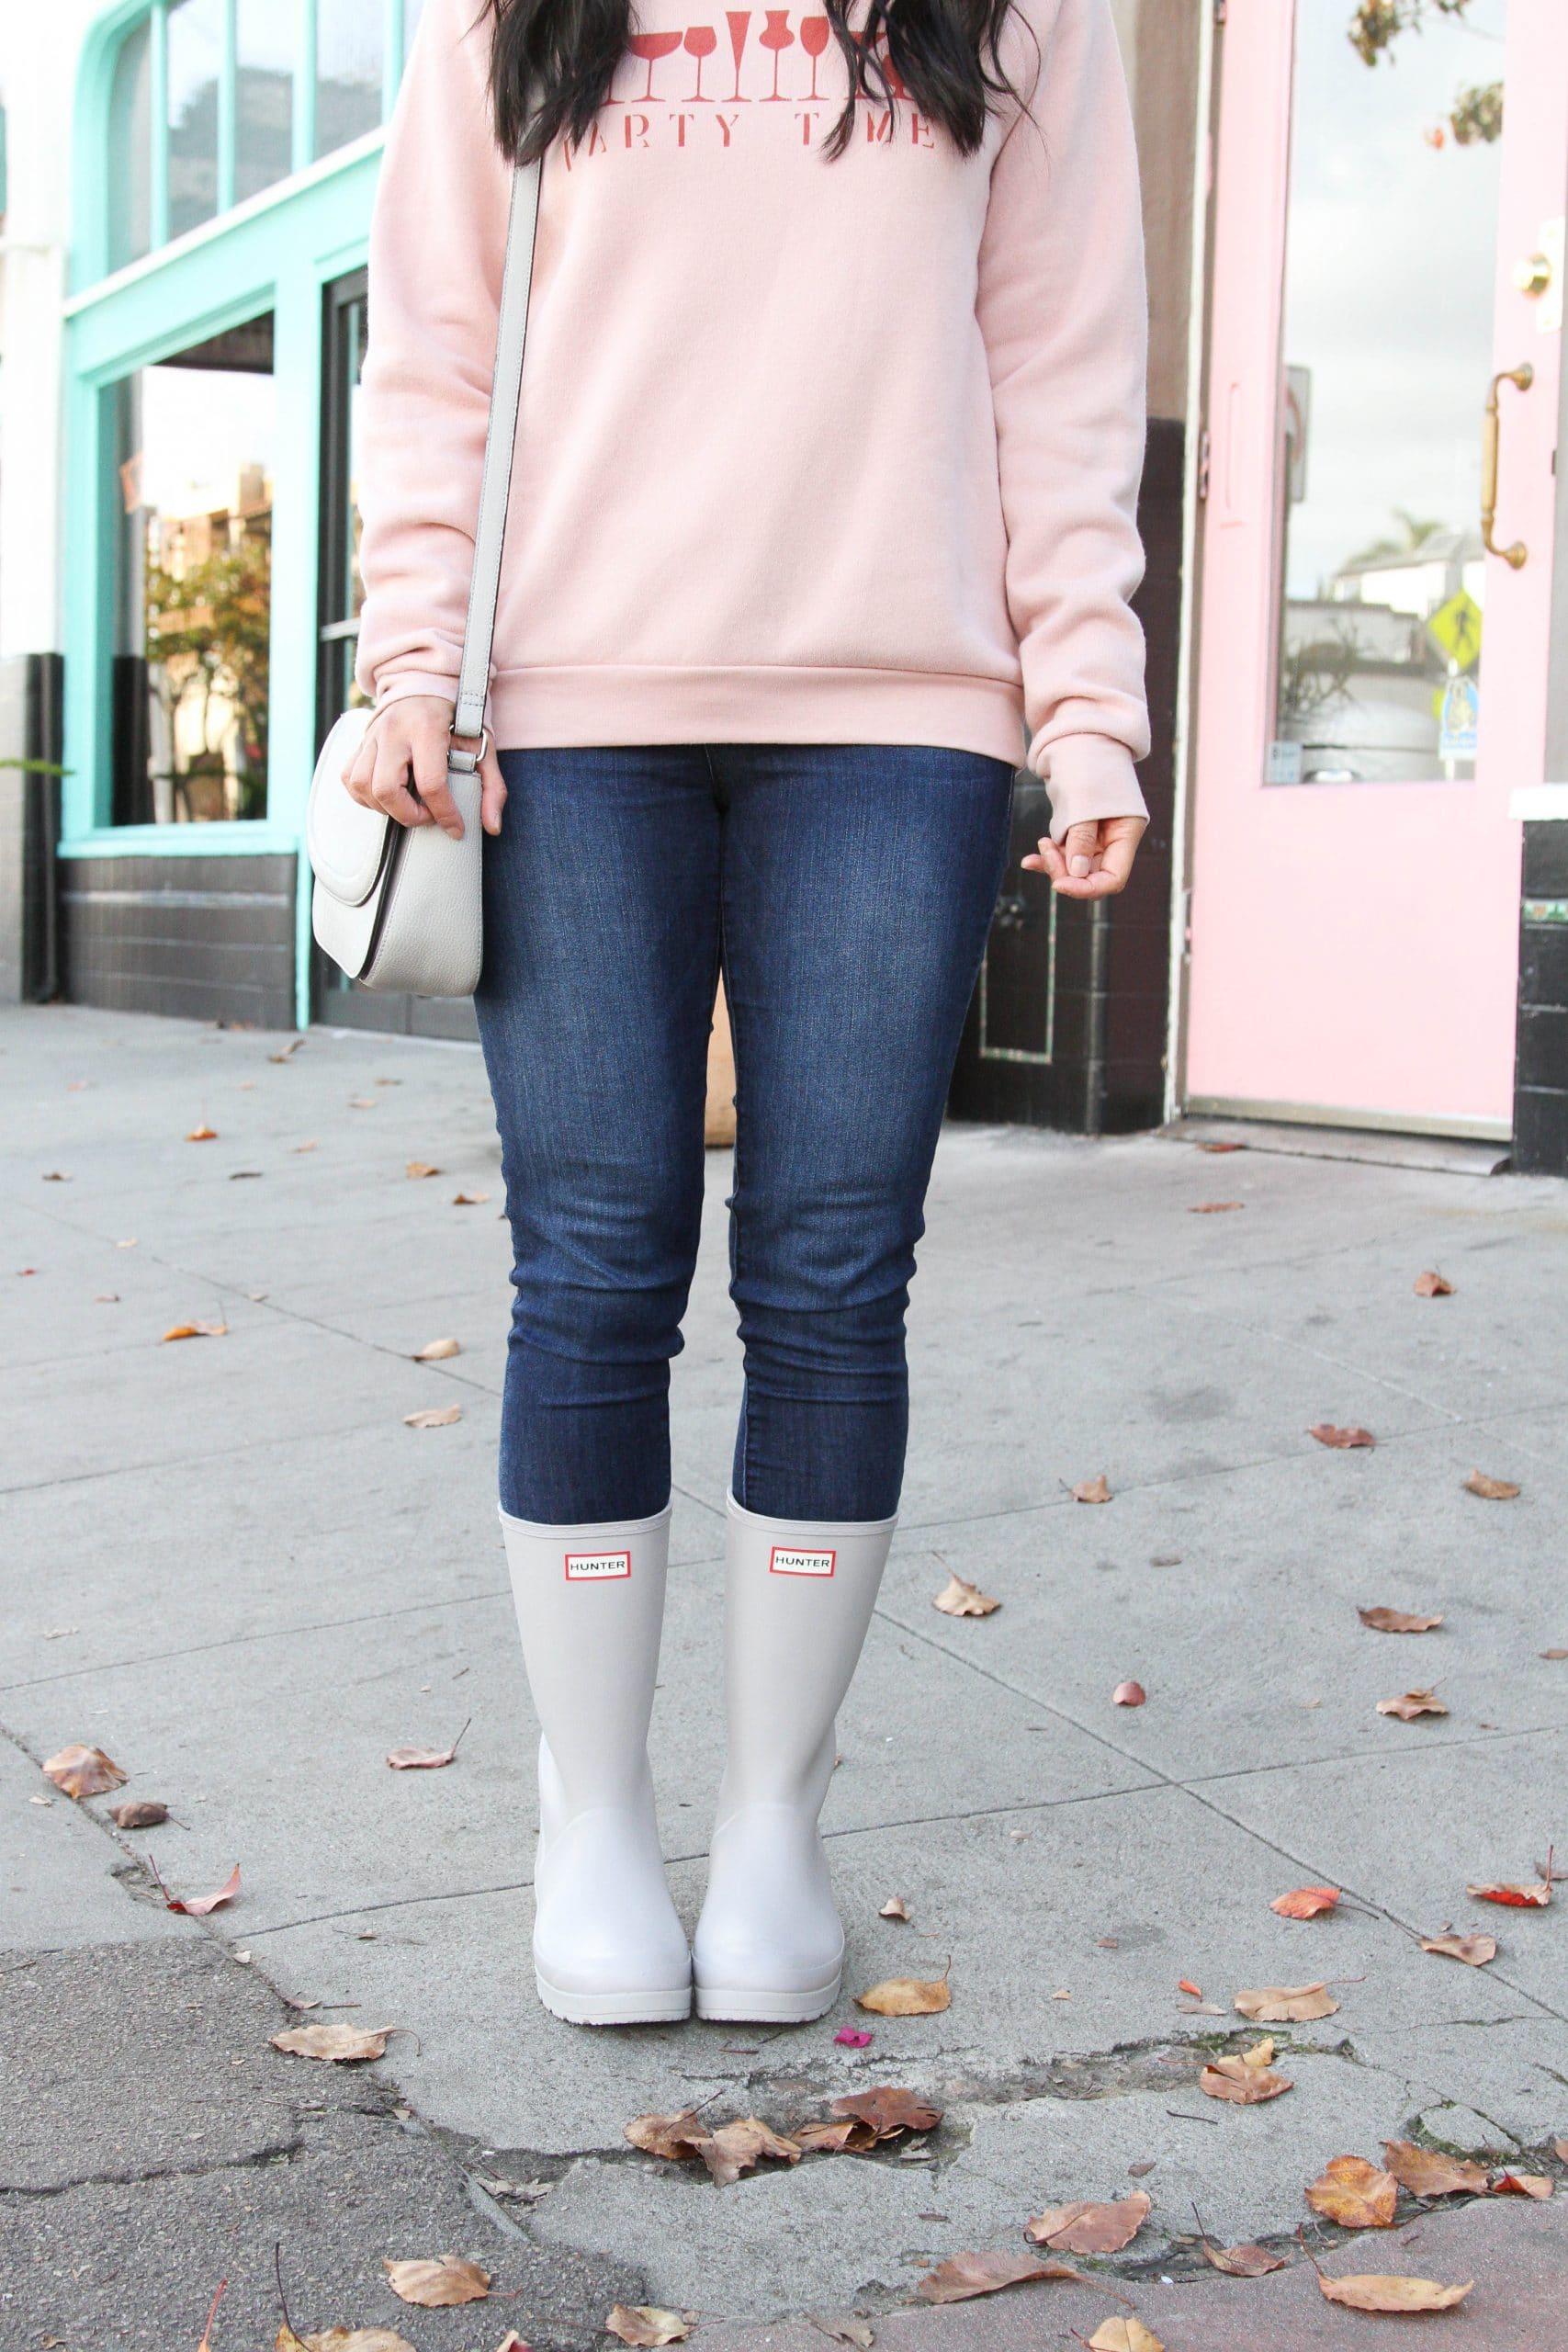 pink sweatshirt + skinny jeans + grey purse + grey rain boots